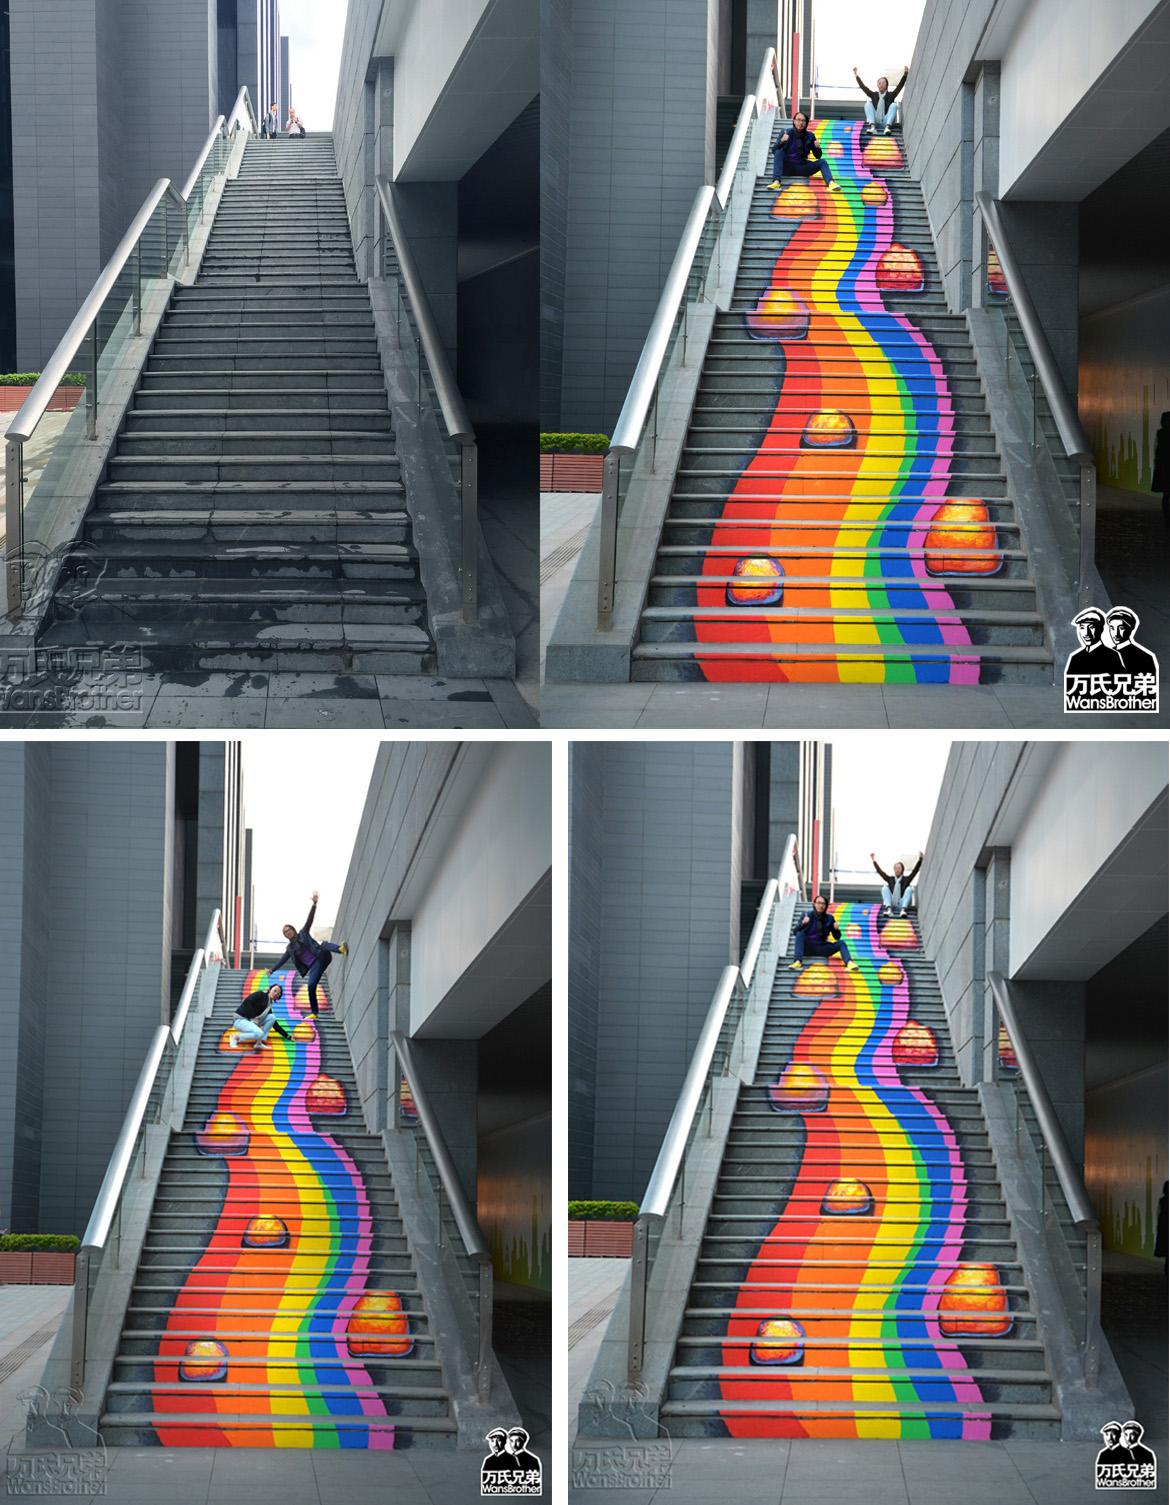 3d错觉楼梯 - 3d地画 - 3d画|3d立体画|万氏兄弟3d画